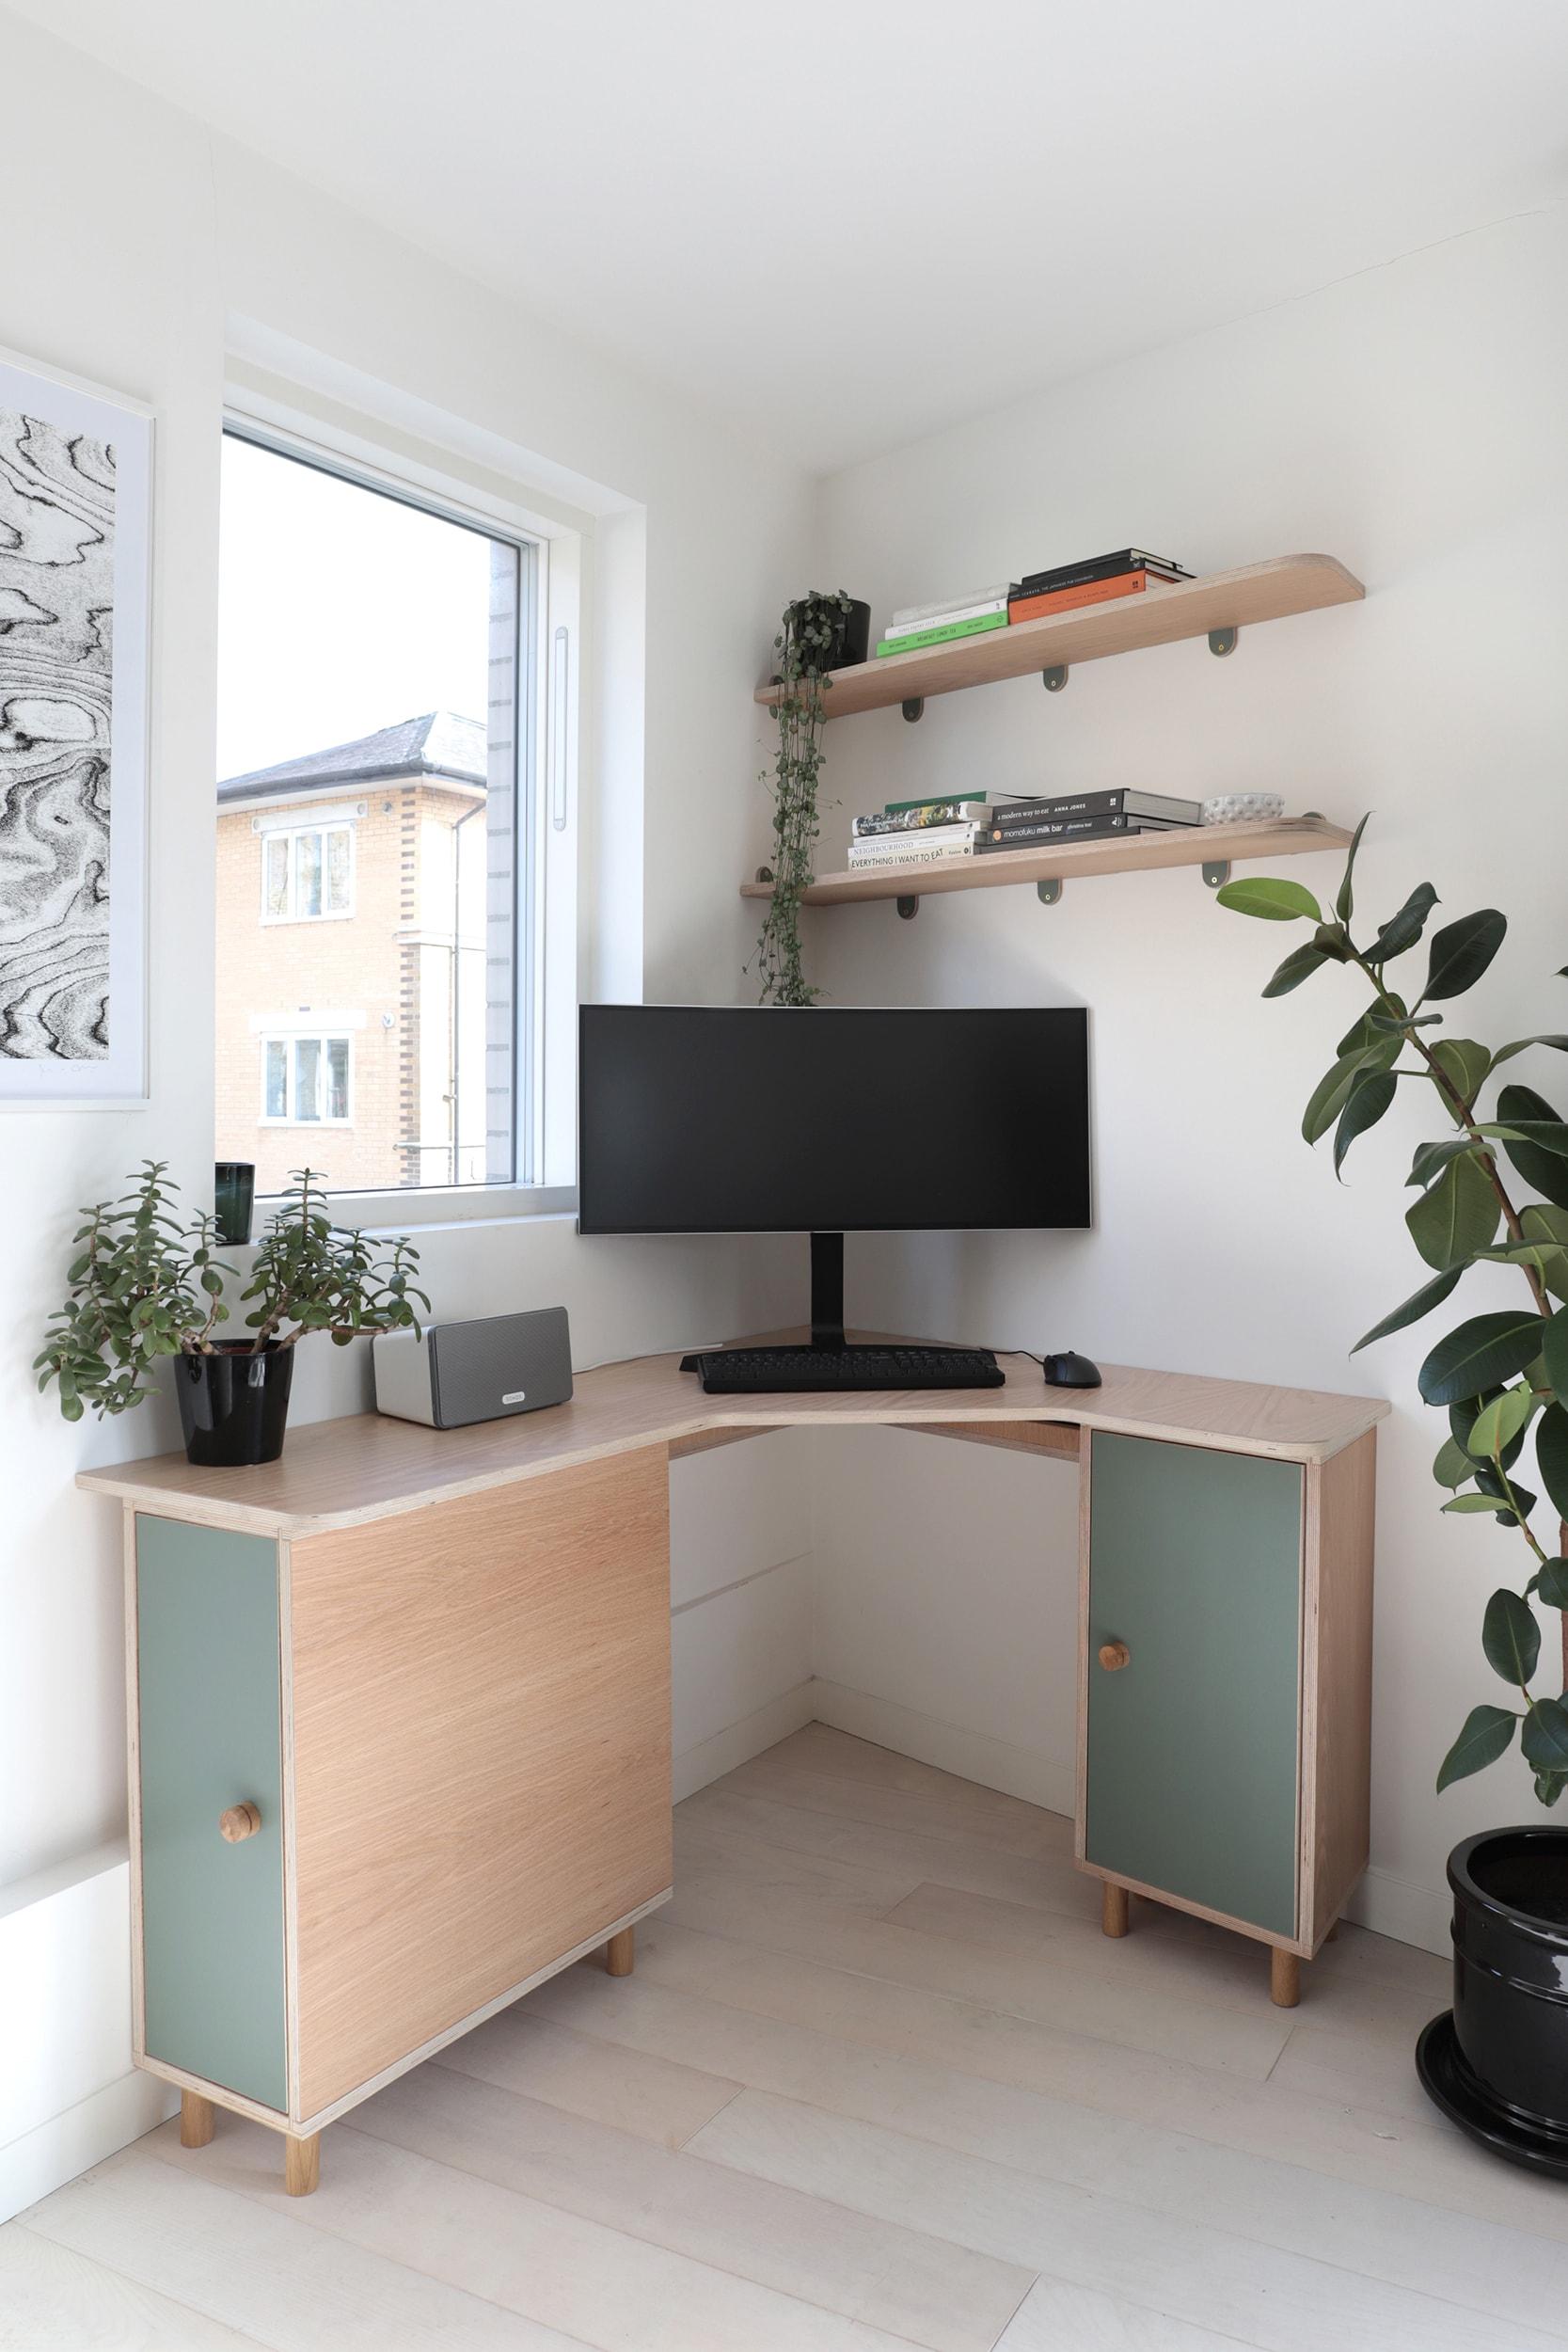 Order 428 - Jessica Barnes - Desk 3 WEB-min.jpg